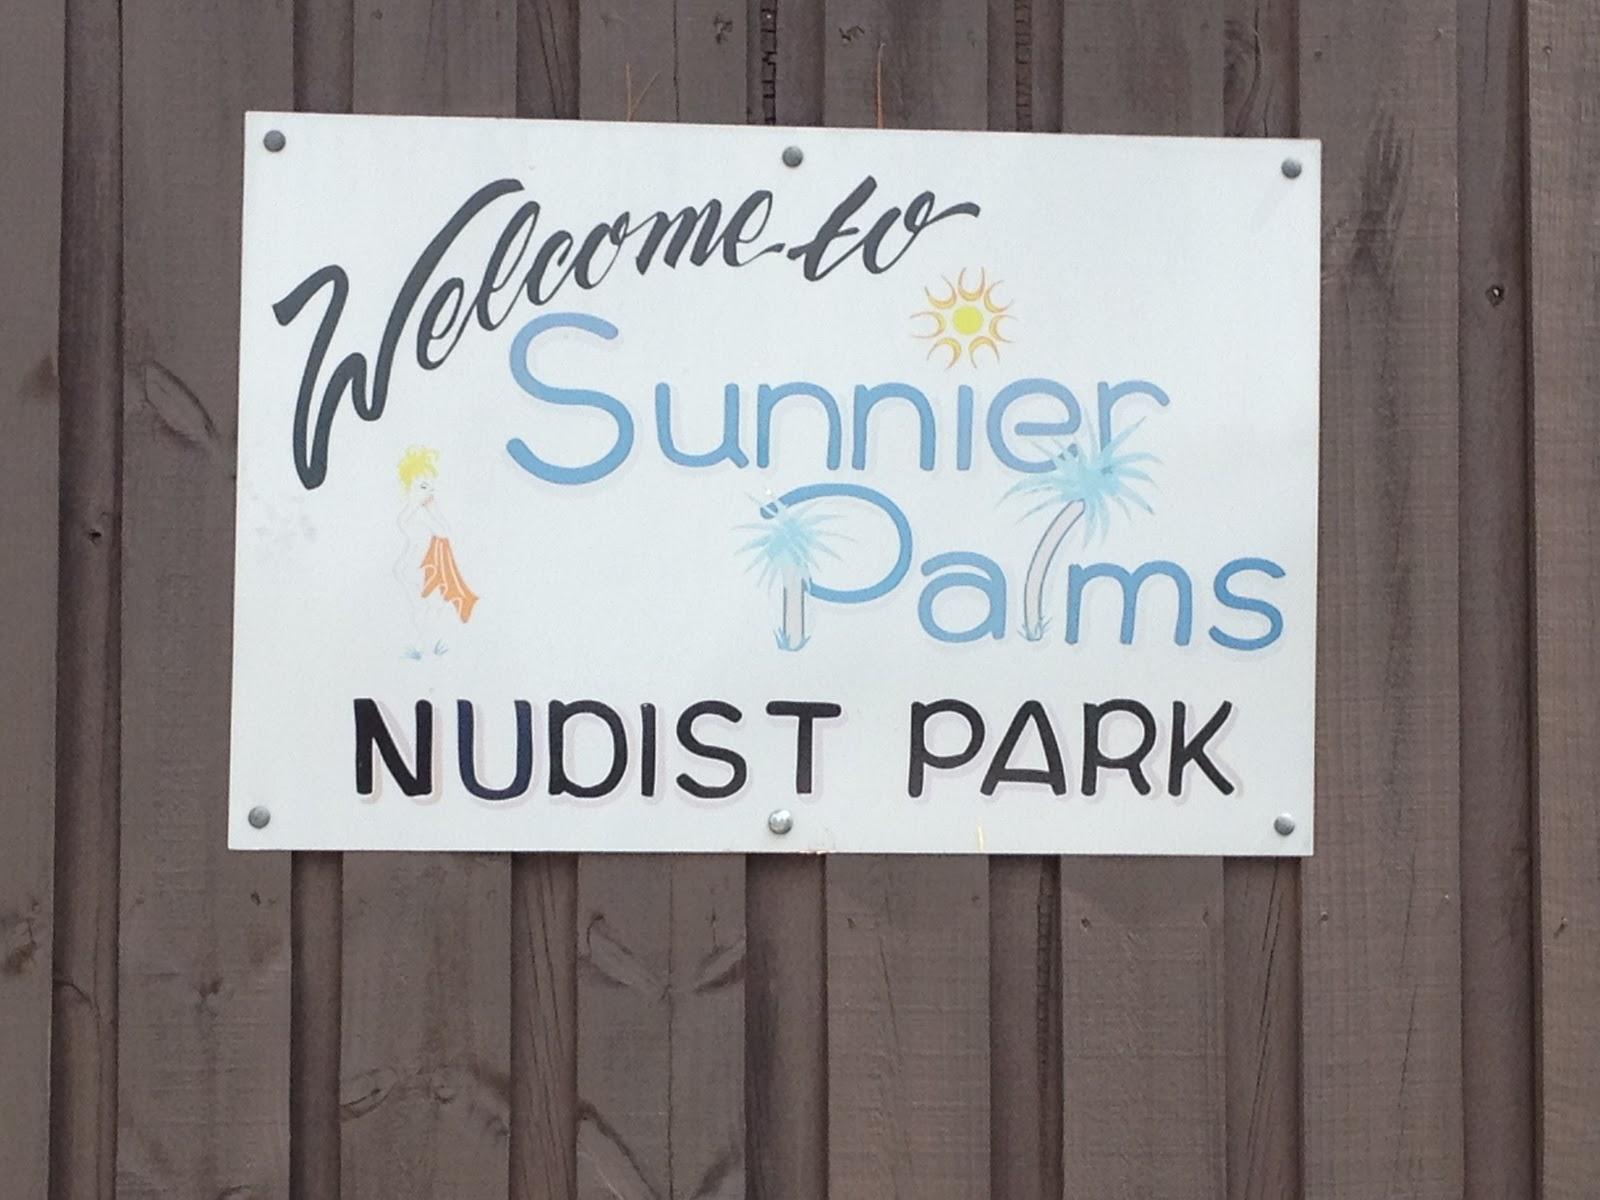 Nudist rooms key west